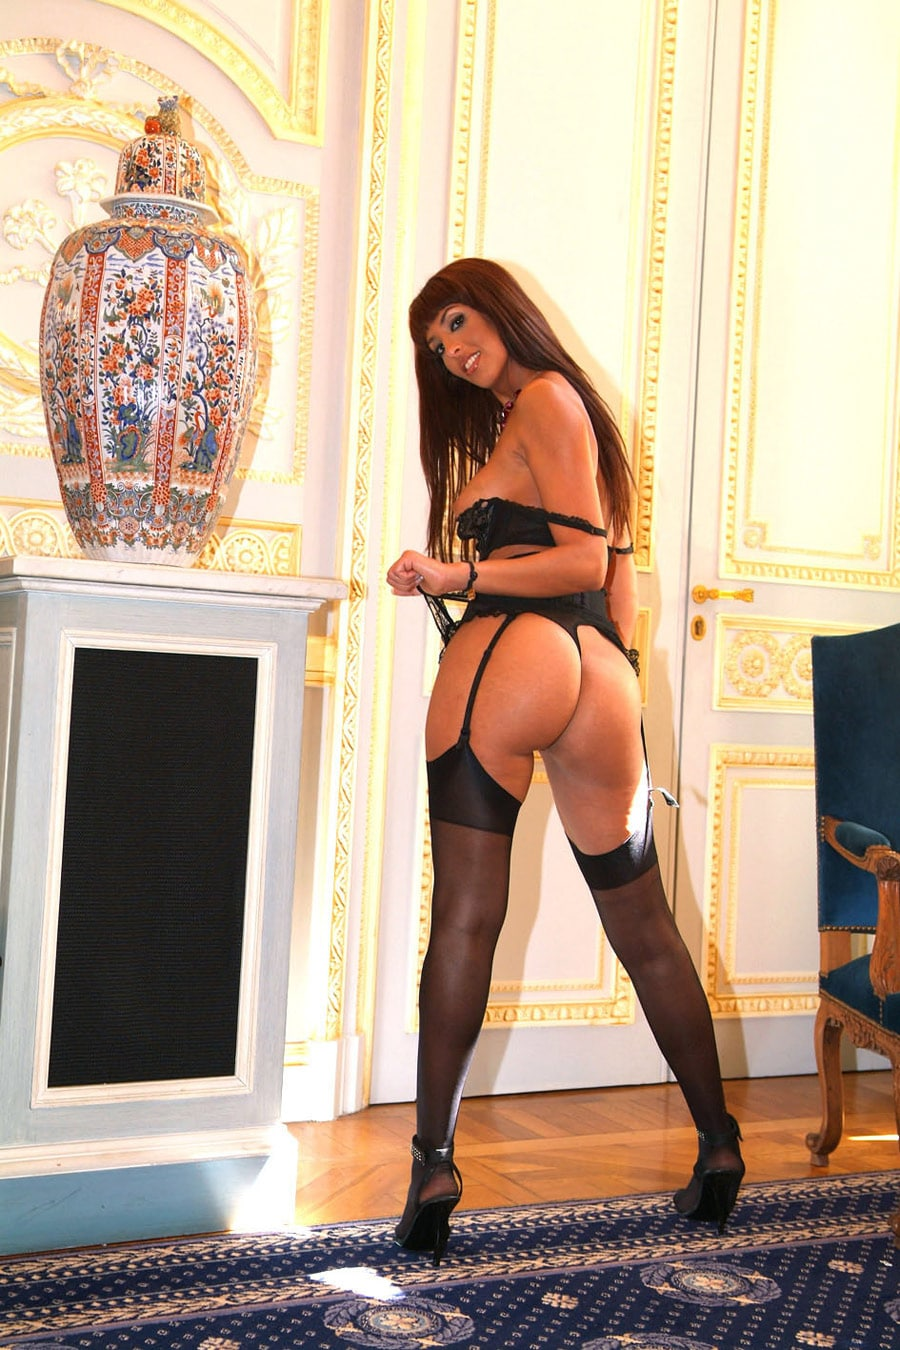 yasmine-bourgeoise-marocaine-sexy-porte-jarretelles-5